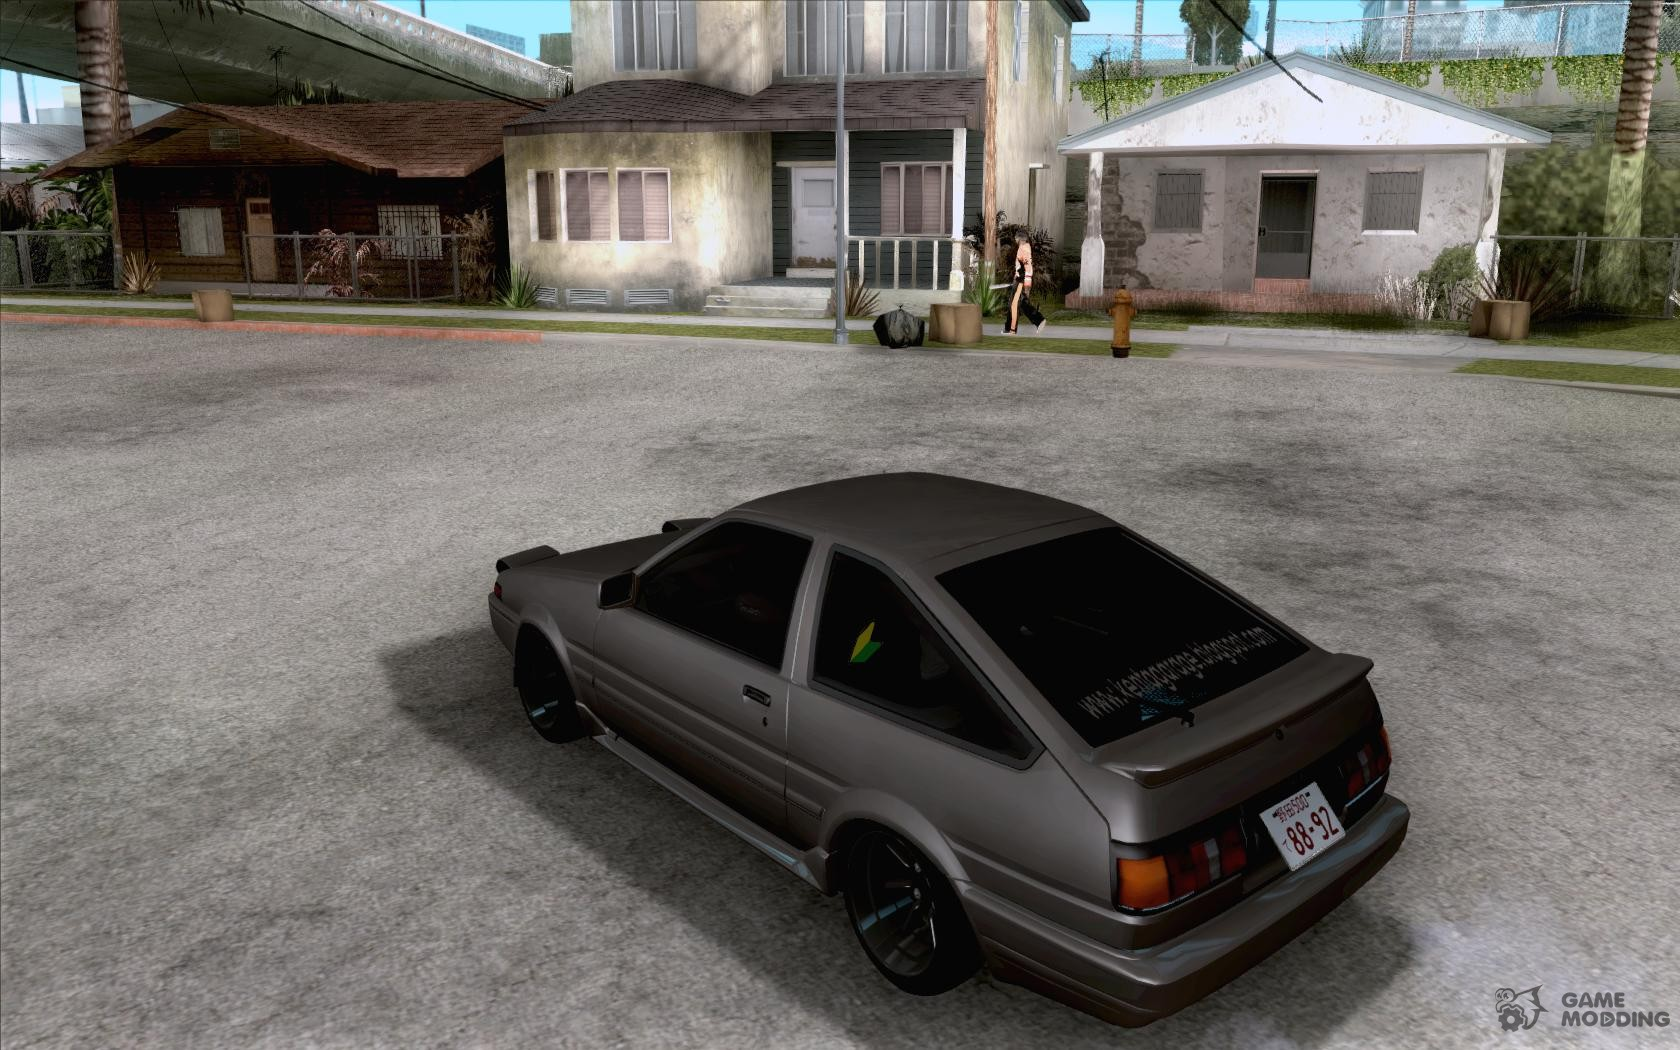 GTA-Moddingcom - Download Area GTA San Andreas